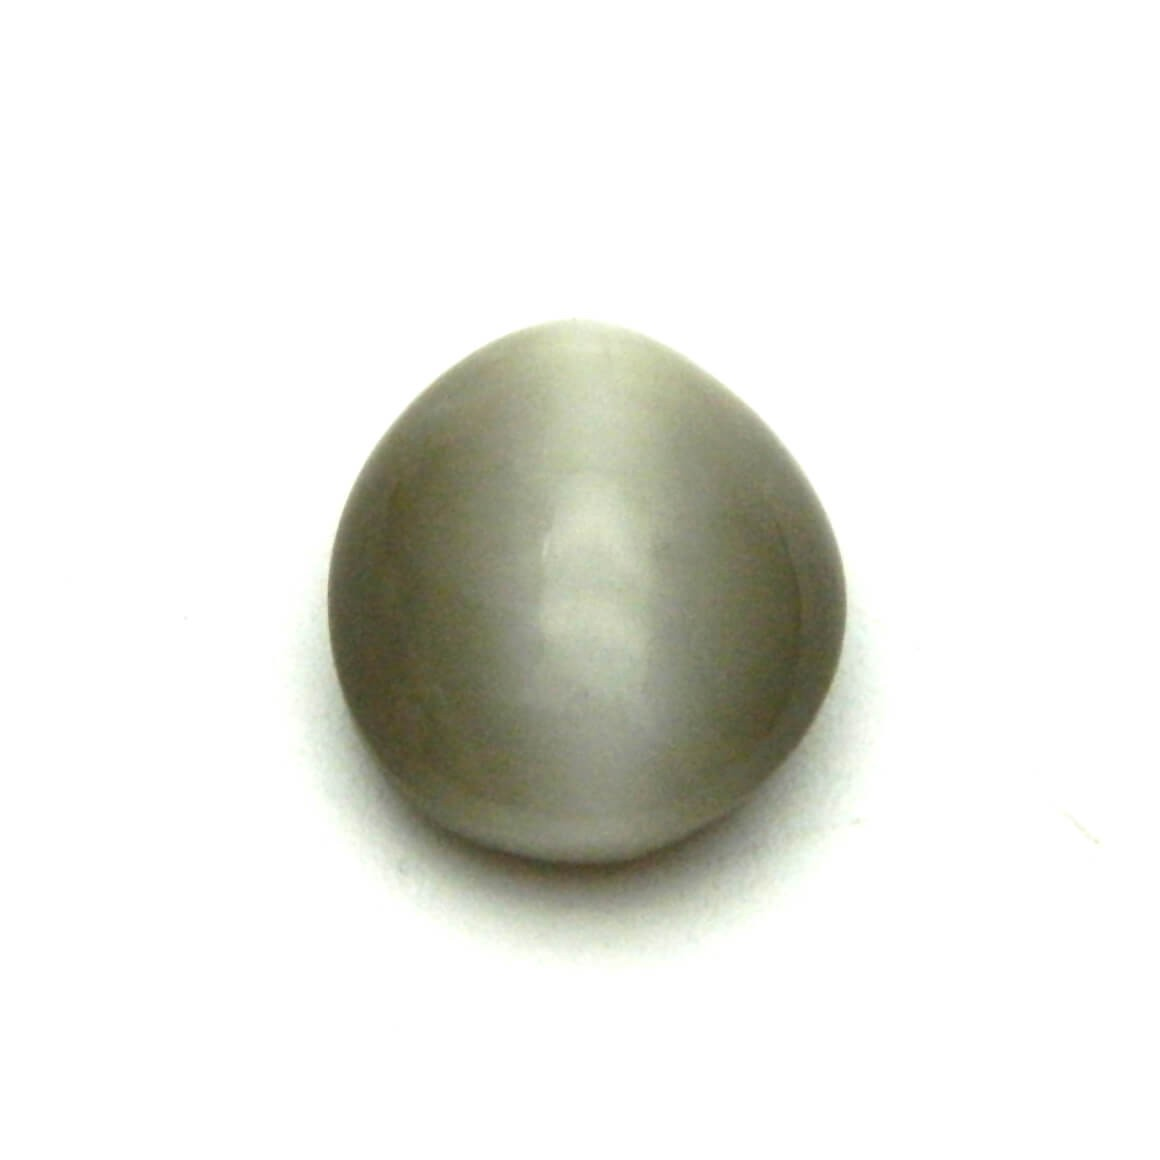 10.41 Carat/ 11.55 Ratti Natural Quartz Cat's Eye Gemstone